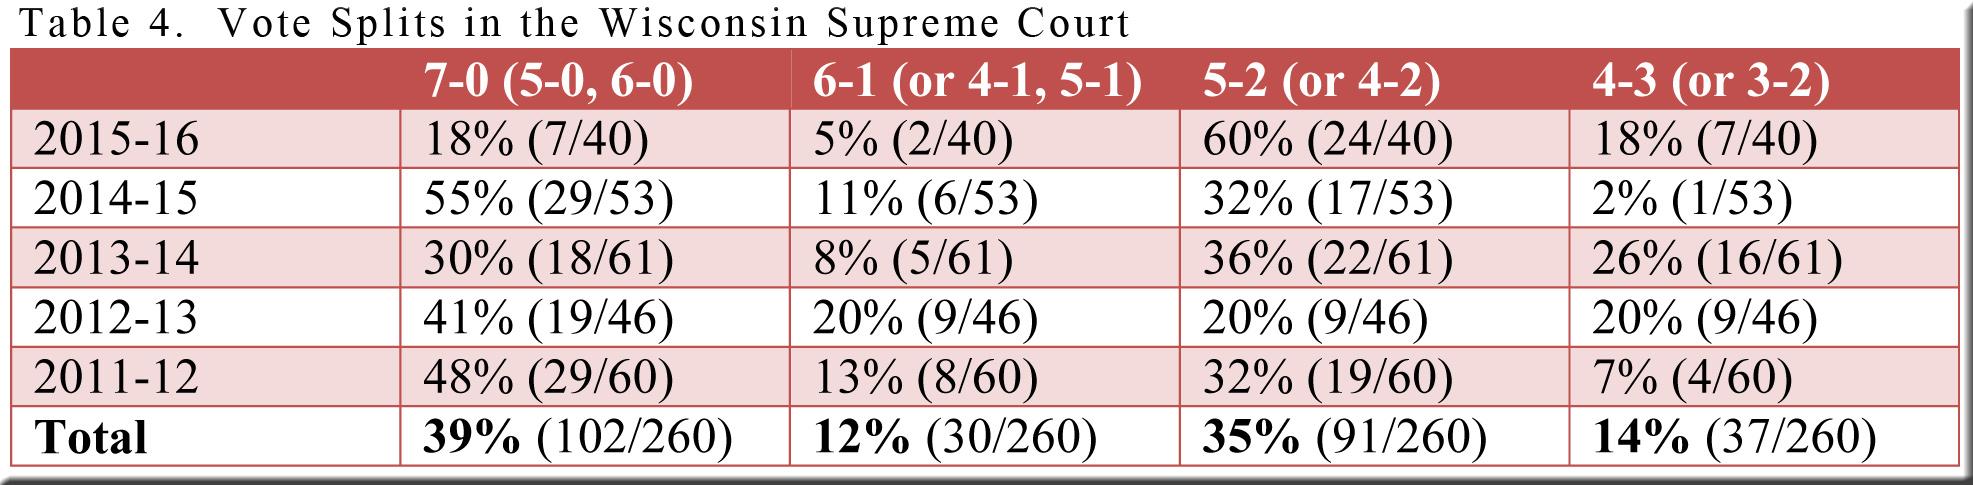 table-4-wi-vote-splits-2011-12-thru-2015-16